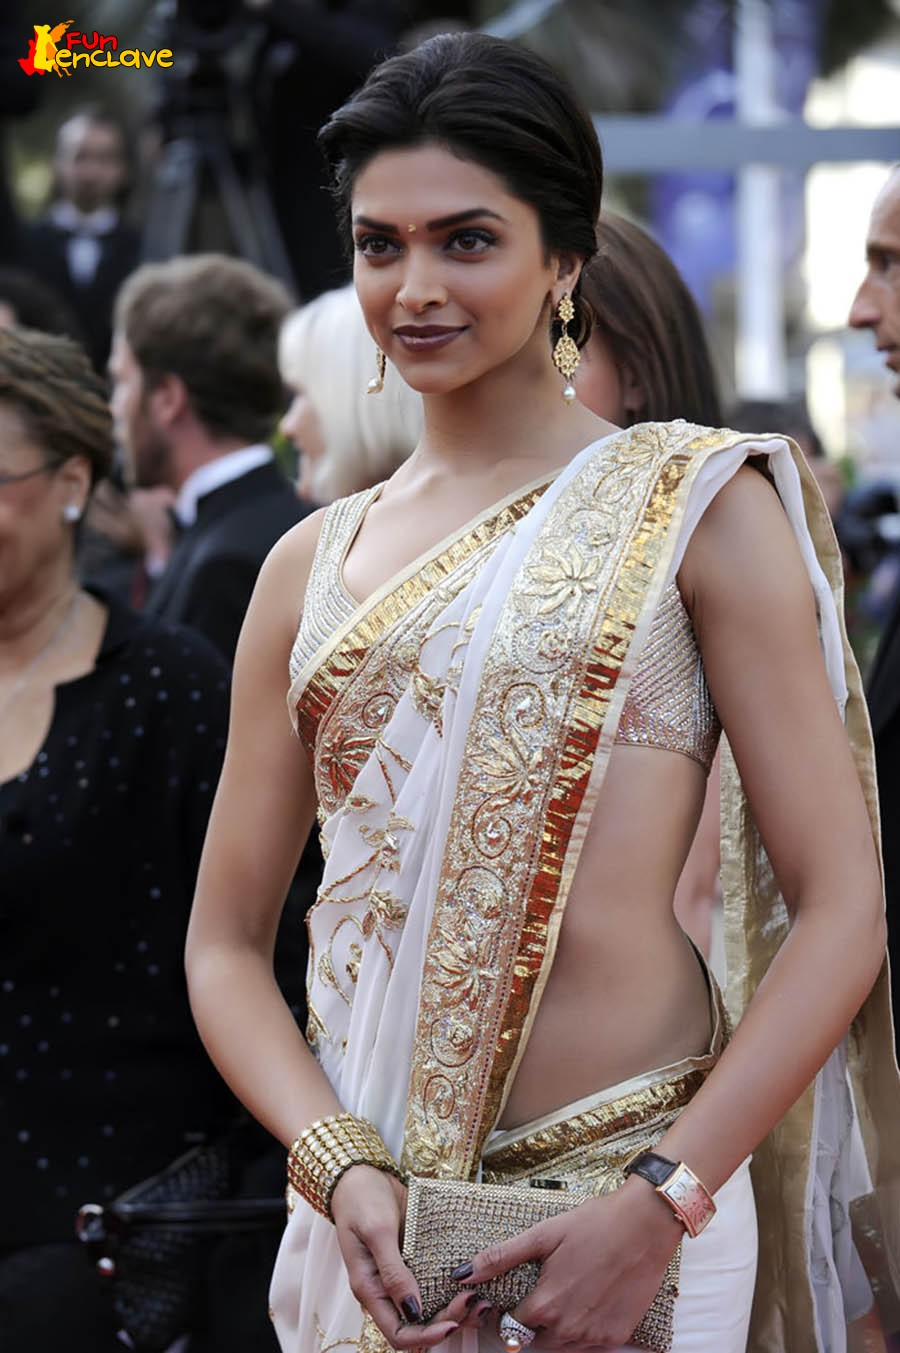 http://4.bp.blogspot.com/_jTFnyODNZMU/TAWi5PUcq2I/AAAAAAAAA-M/J7yZ1ieNzLs/s1600/Deepika-in-a-Rohit-Bal-Saree-at-Cannes.jpg